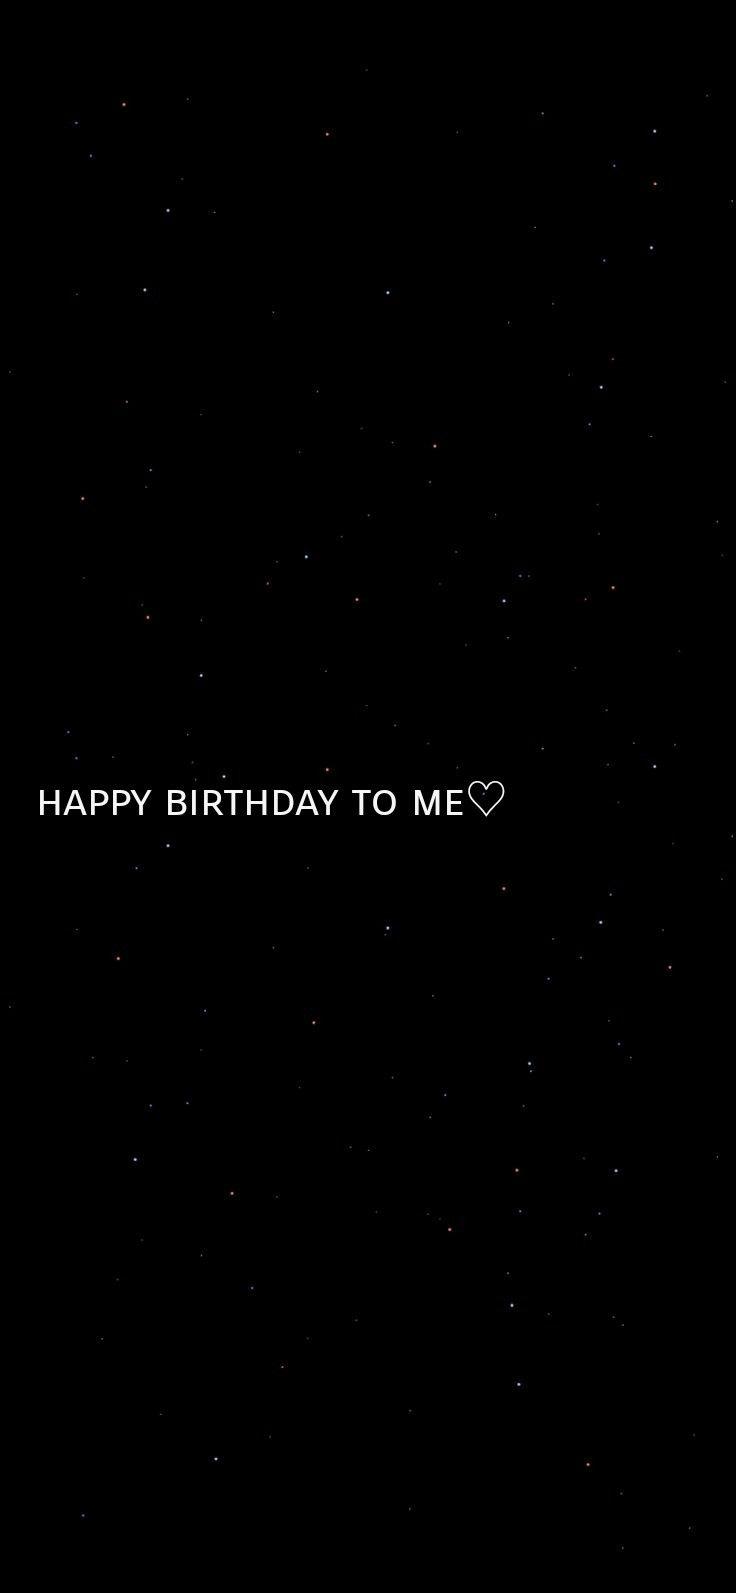 Happy Birthday To Me Wallpaper Black Minimalistic Cute Aesthetic Happy Birthday To Me Quotes Happy Birthday Me Happy Birthday Wallpaper